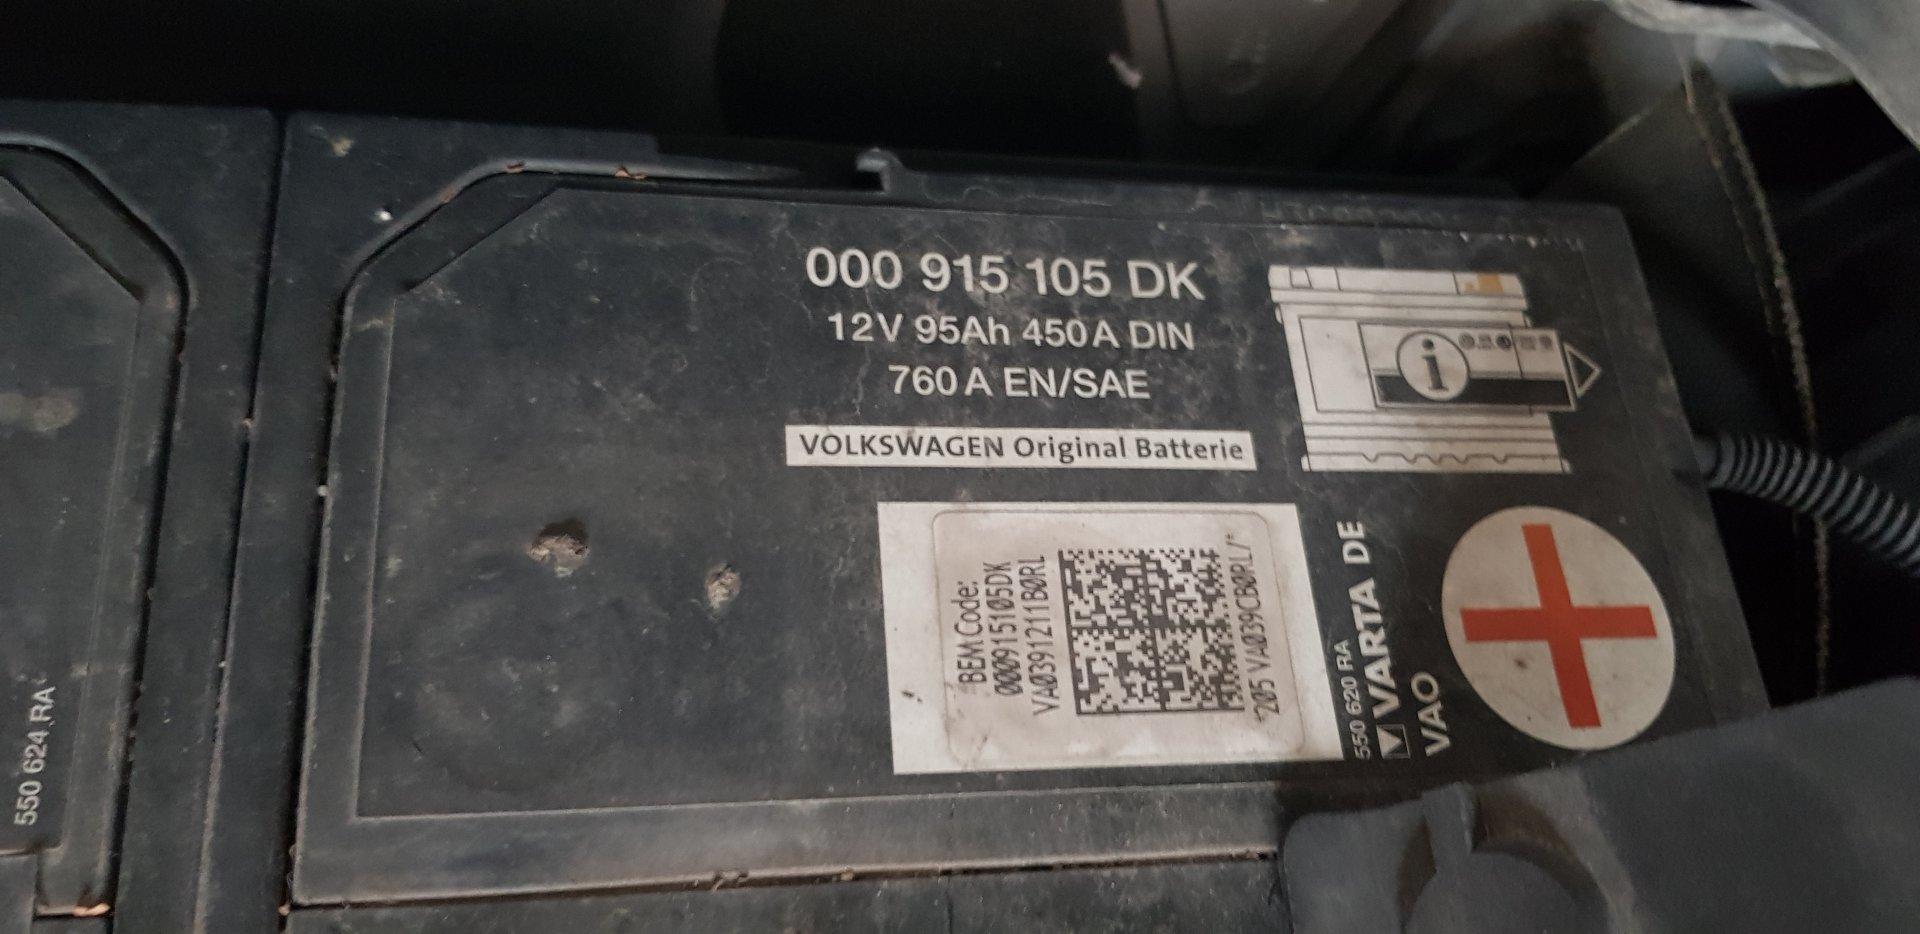 Jaki Akumulator Do Audi A4 B7 1 9 Tdi Kuvat Kritische Theorie